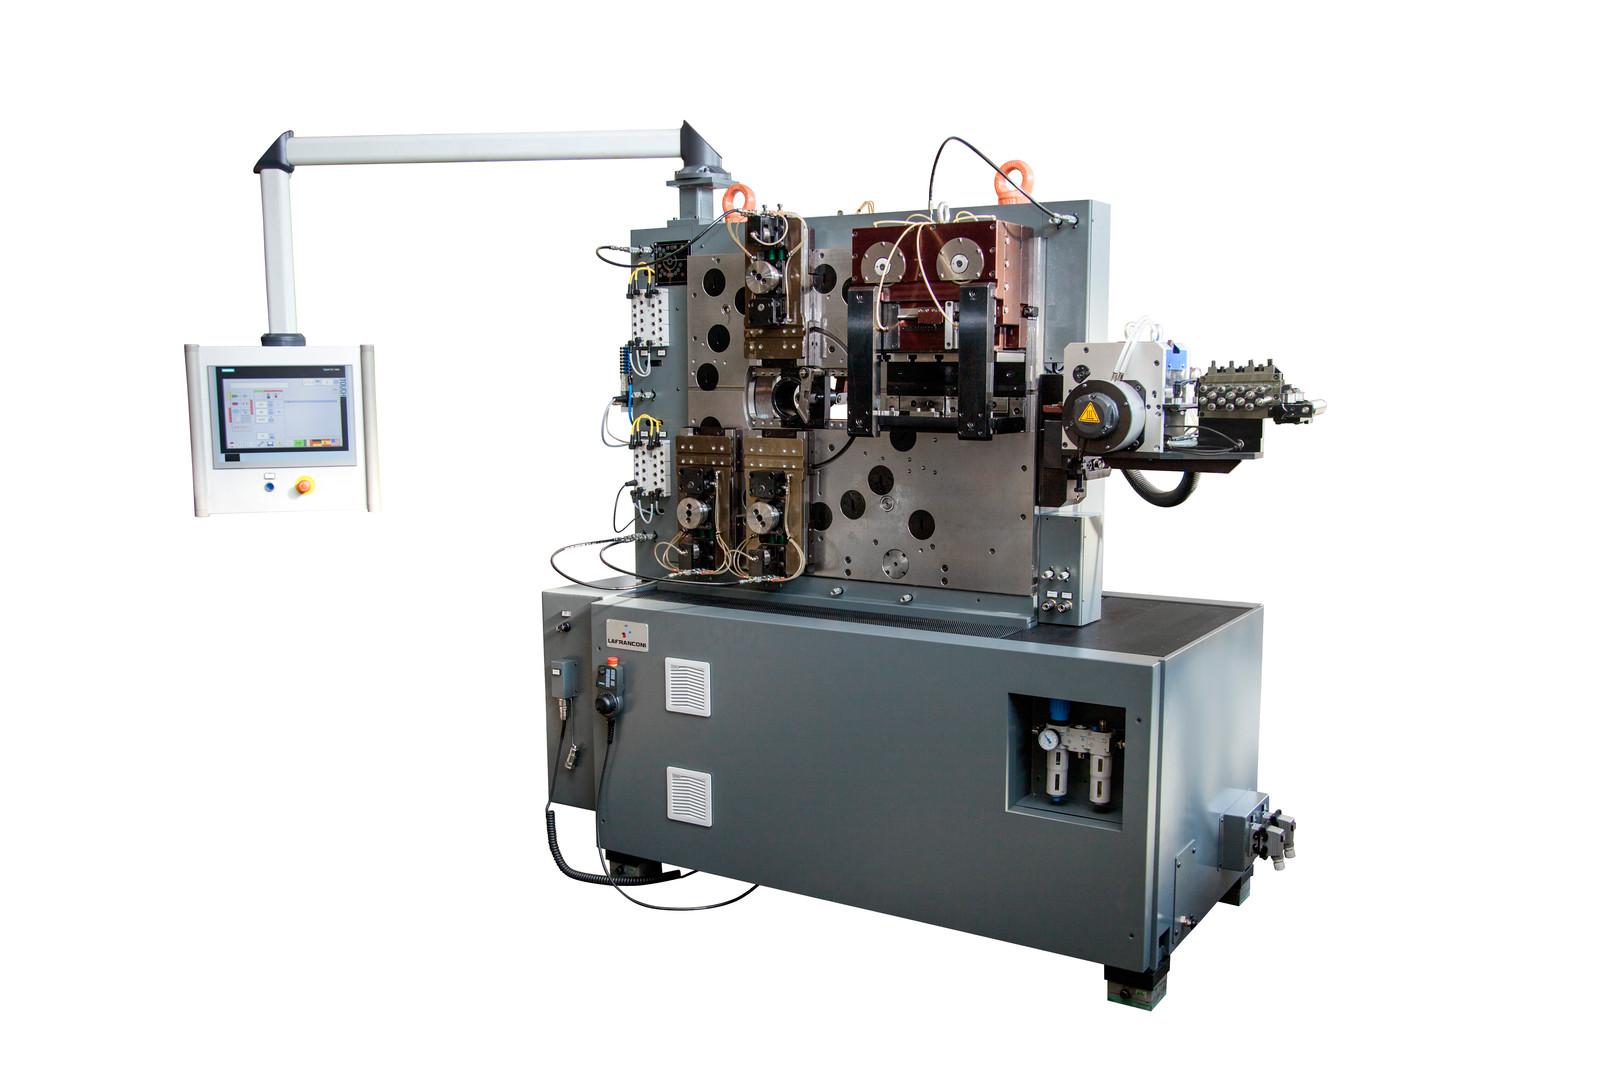 LM 400 PLUS S XL_01.jpg